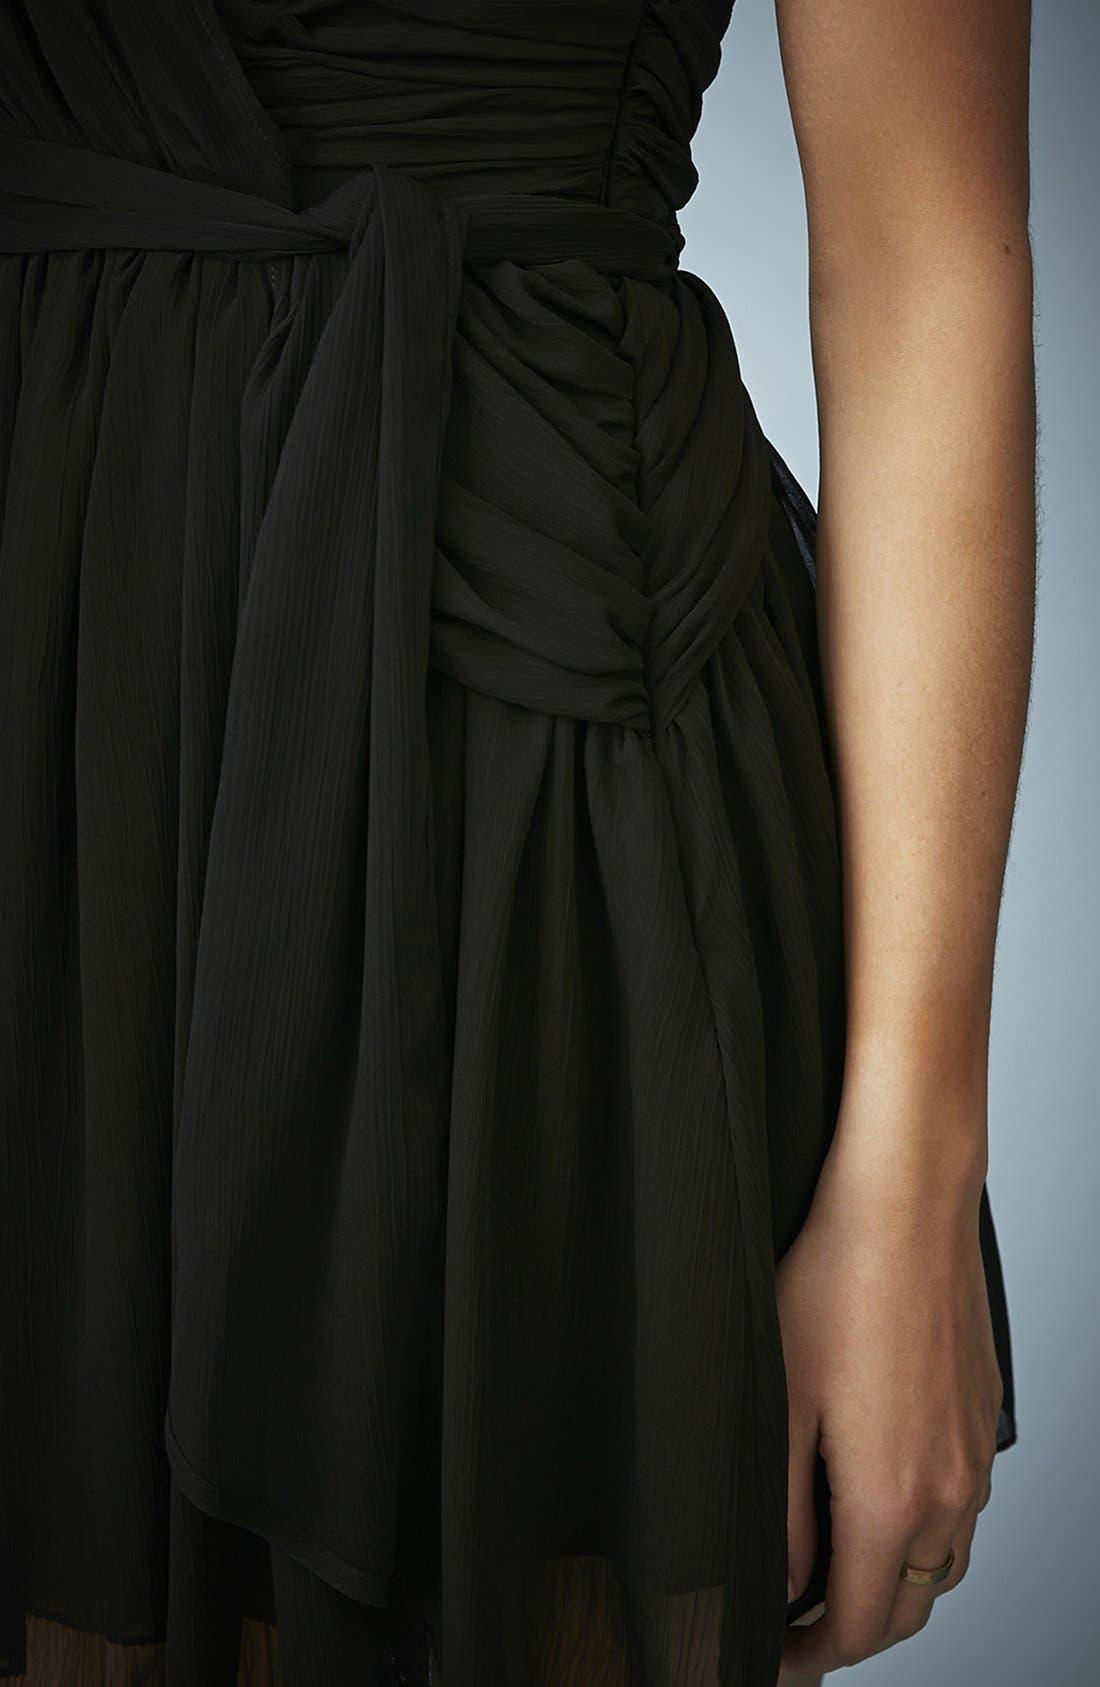 TOPSHOP, Kate Moss for Topshop One-Shoulder Chiffon Dress, Alternate thumbnail 2, color, 001